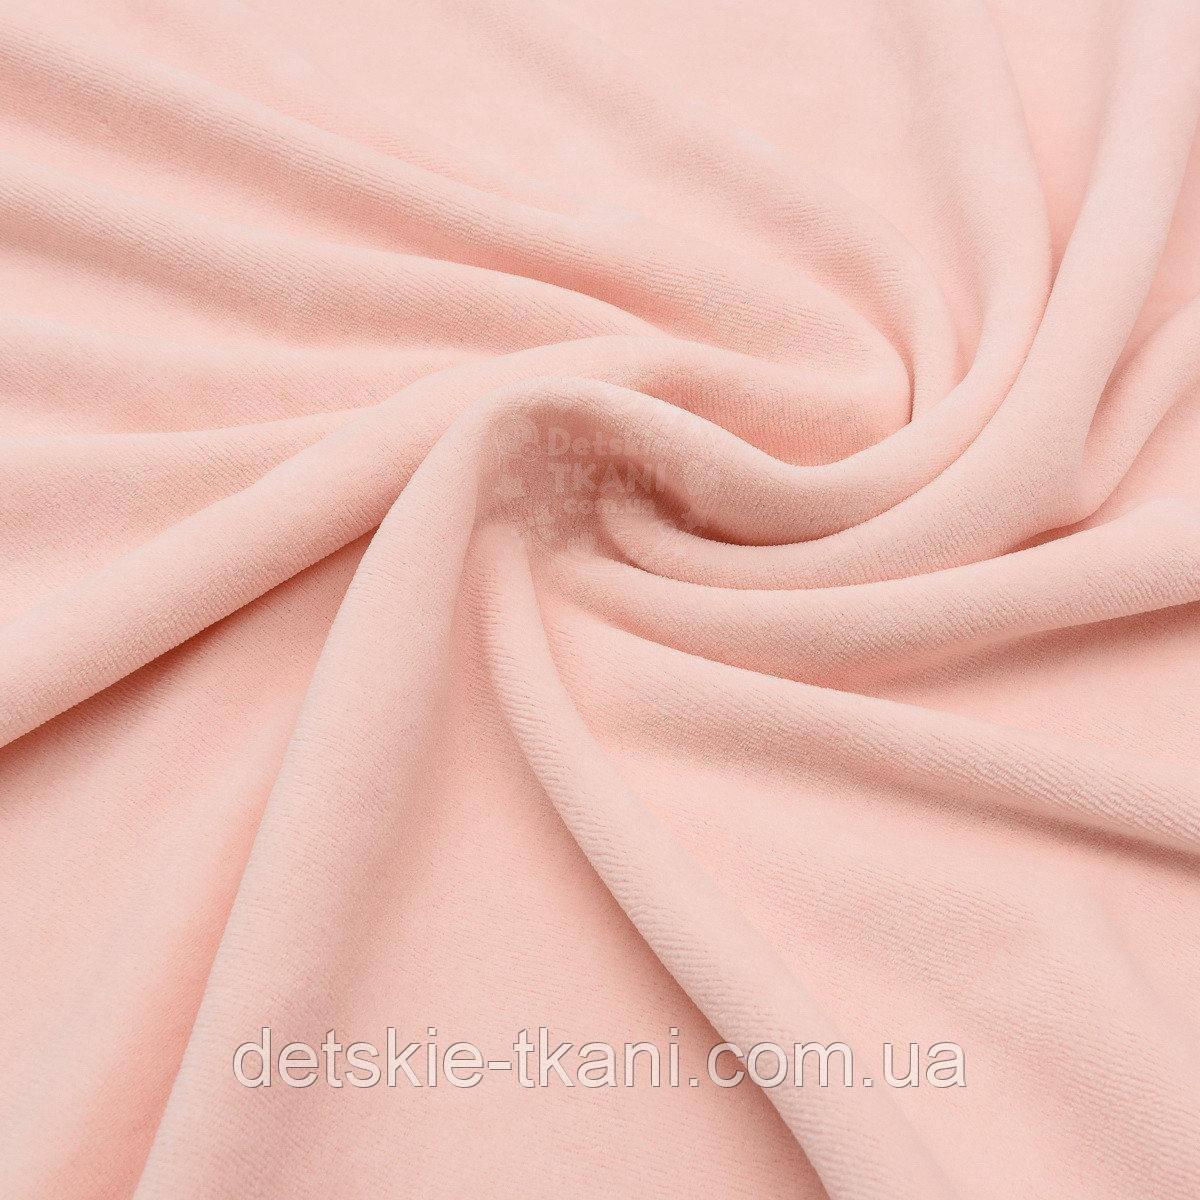 Лоскут однотонного  ХБ велюра бледно-розового цвета, размер 100*80 см